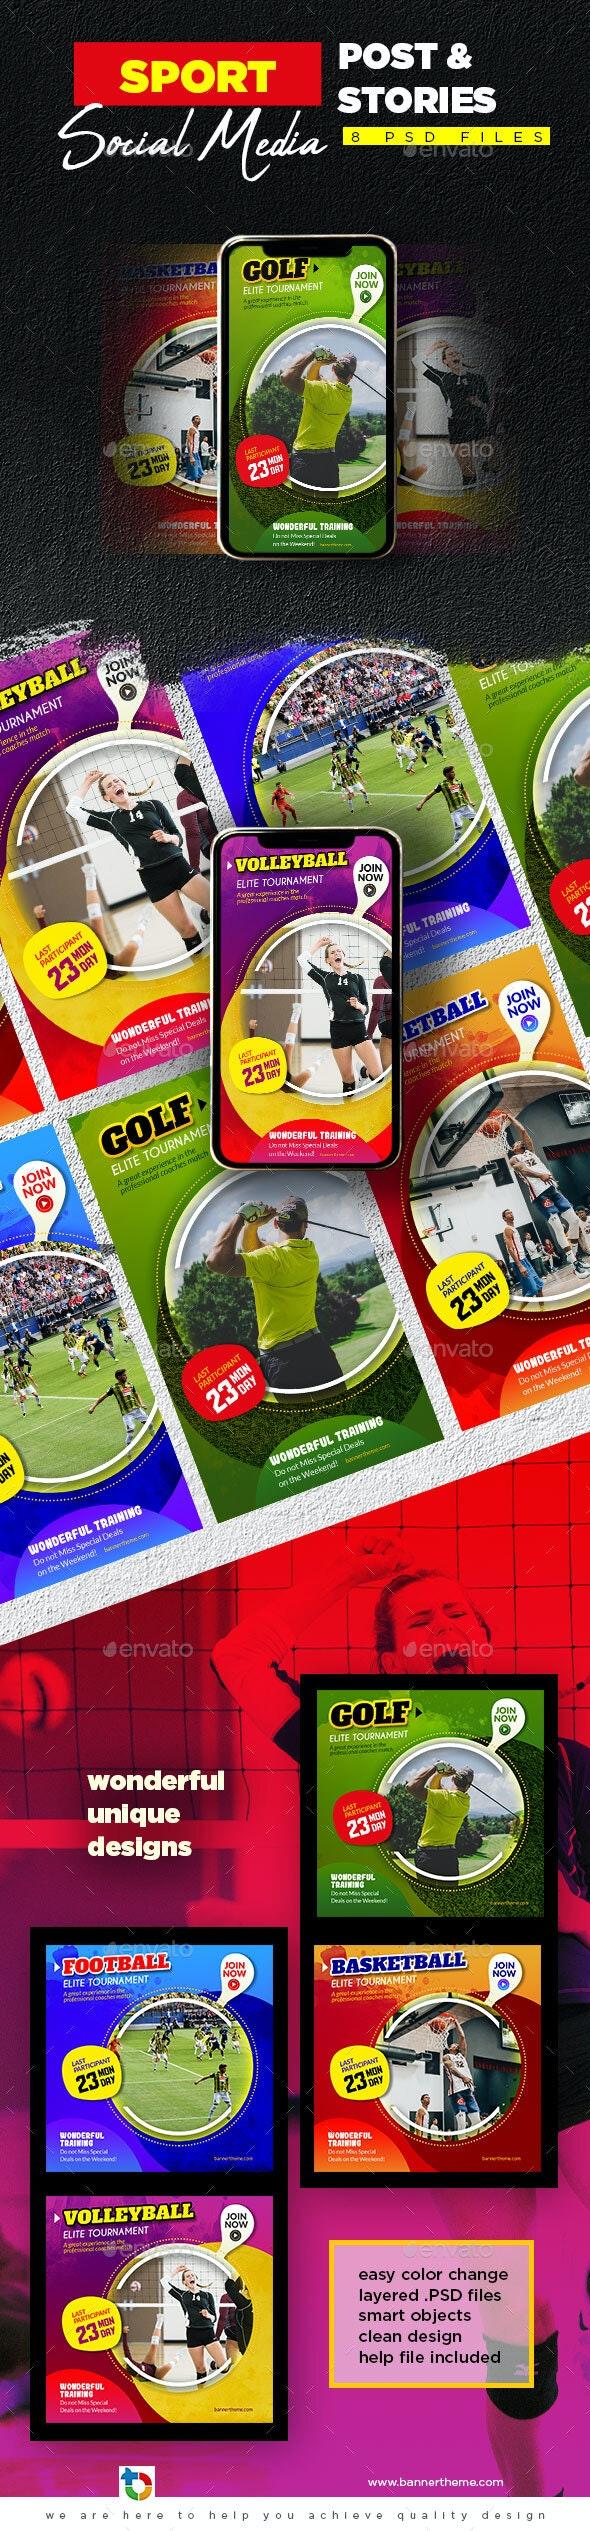 Sport Social Media Post & Stories - Social Media Web Elements